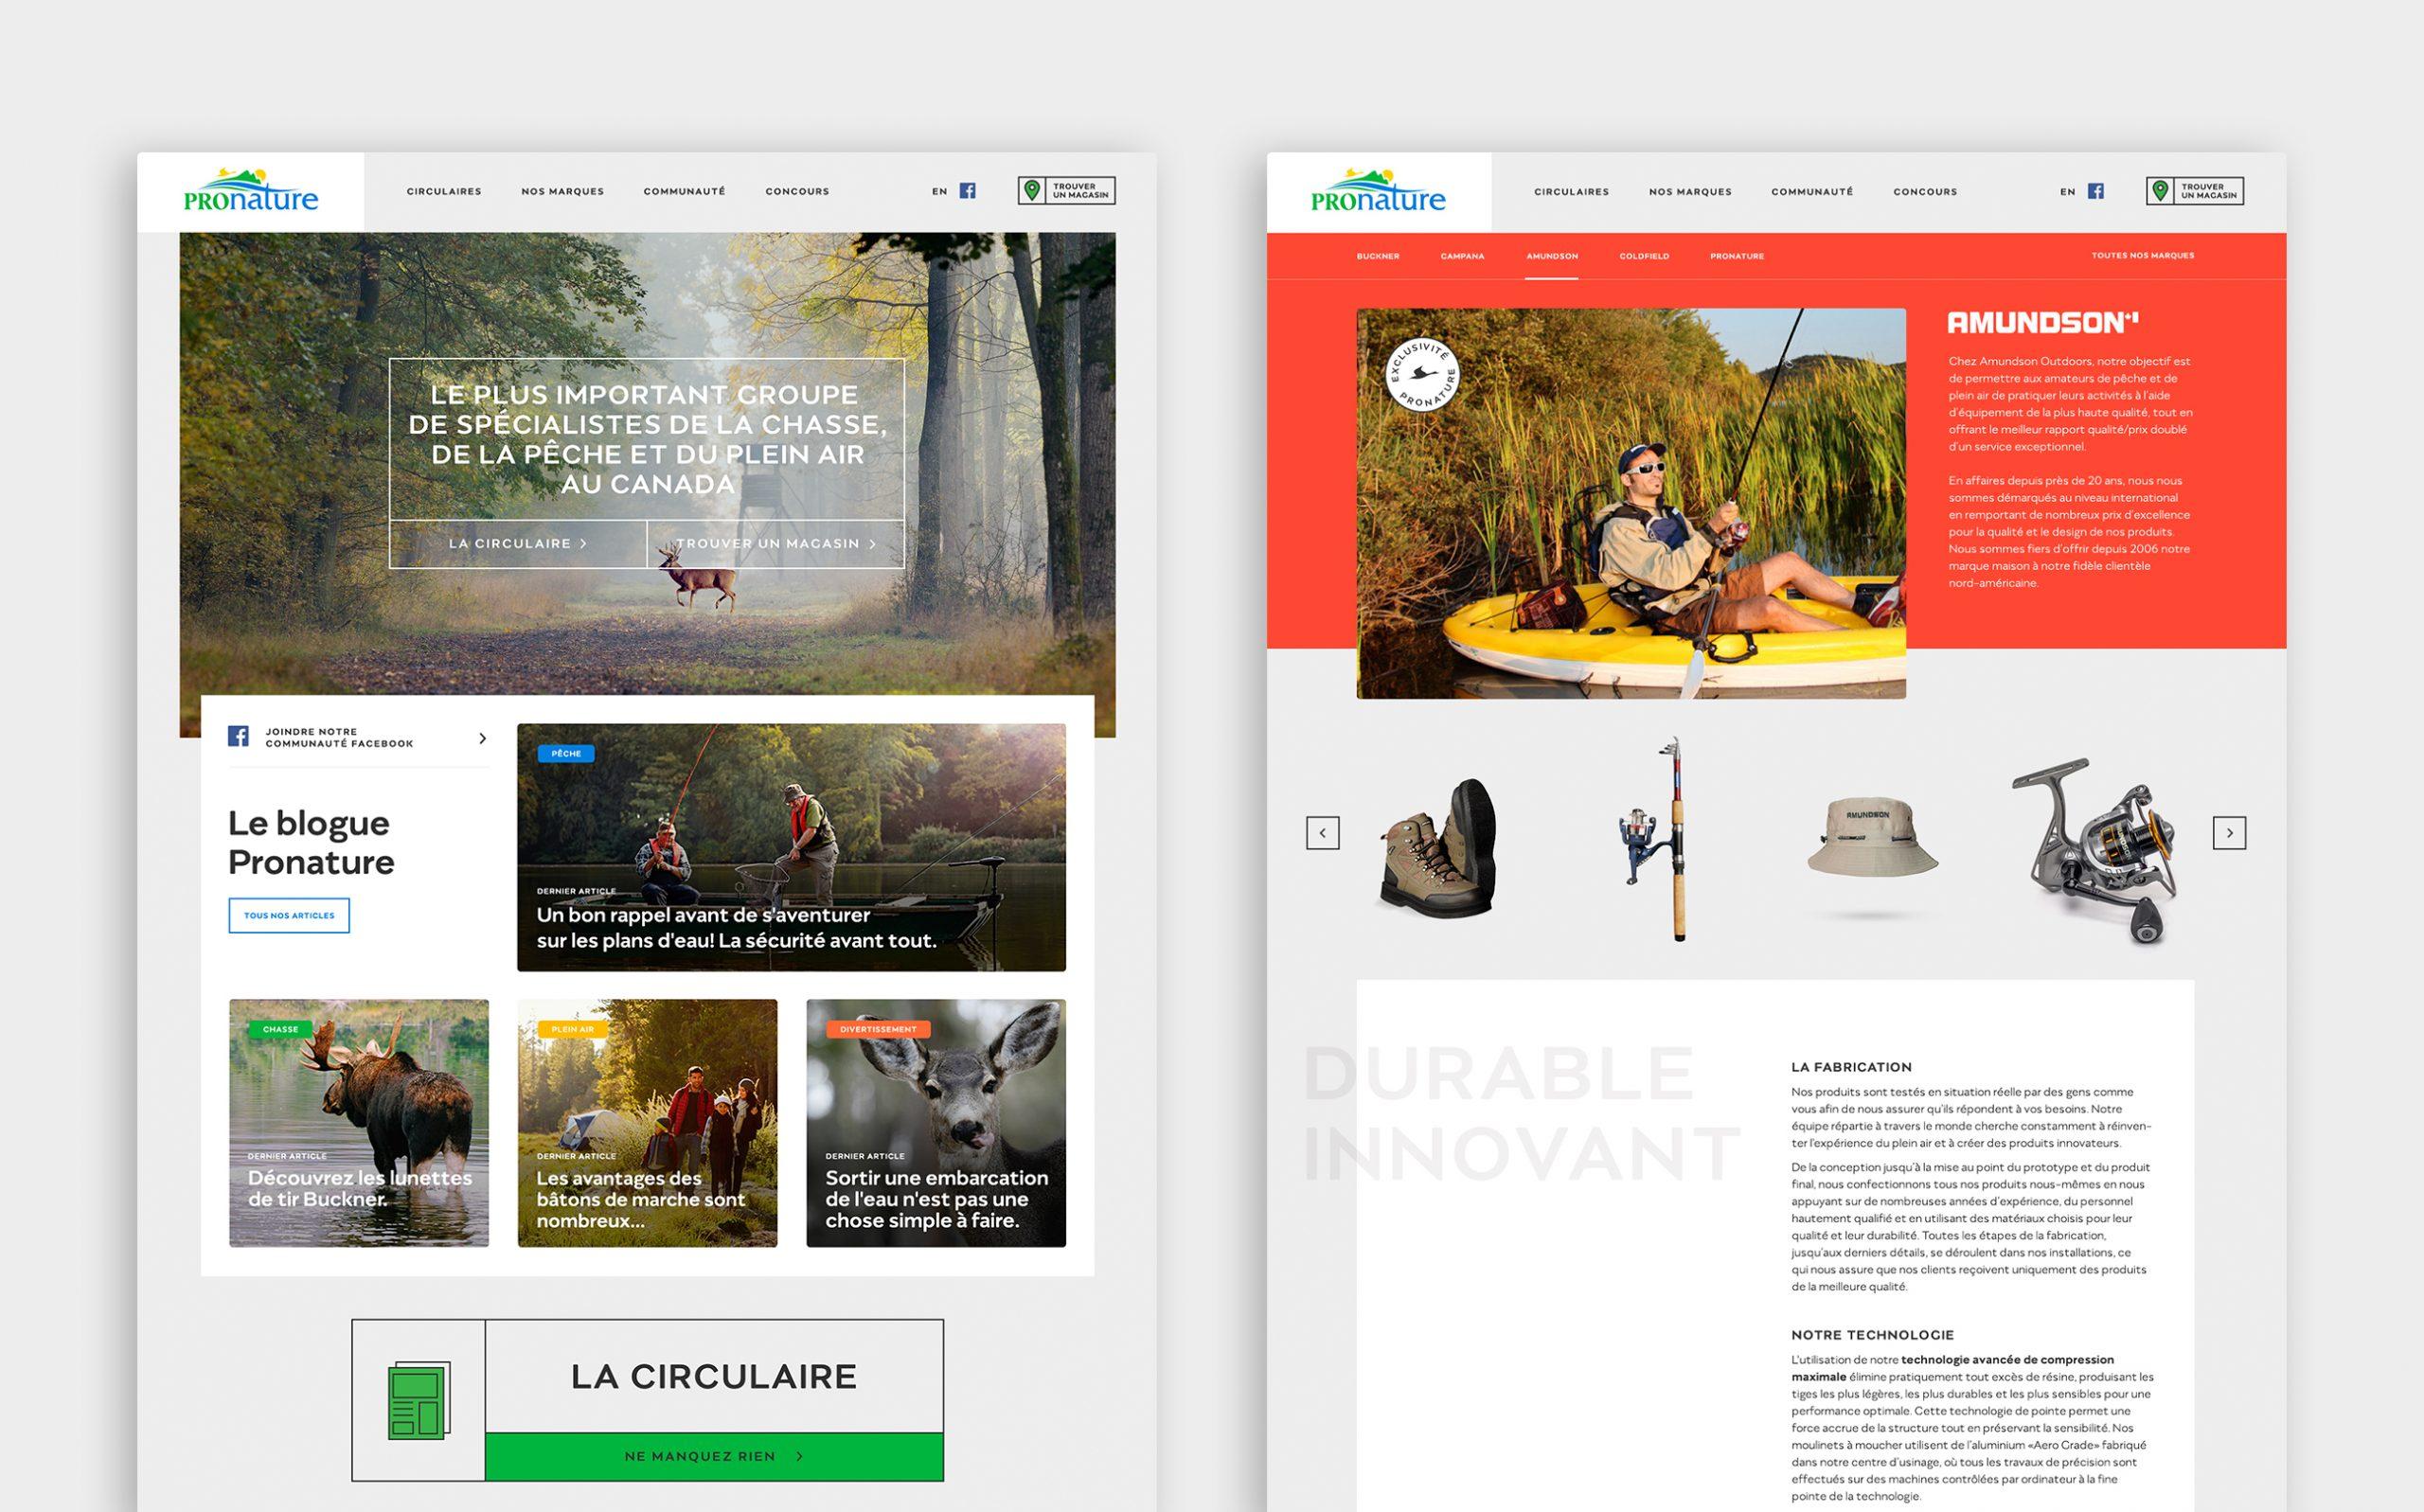 Turbulences-projet-pronature-site-web-desktop-blogue